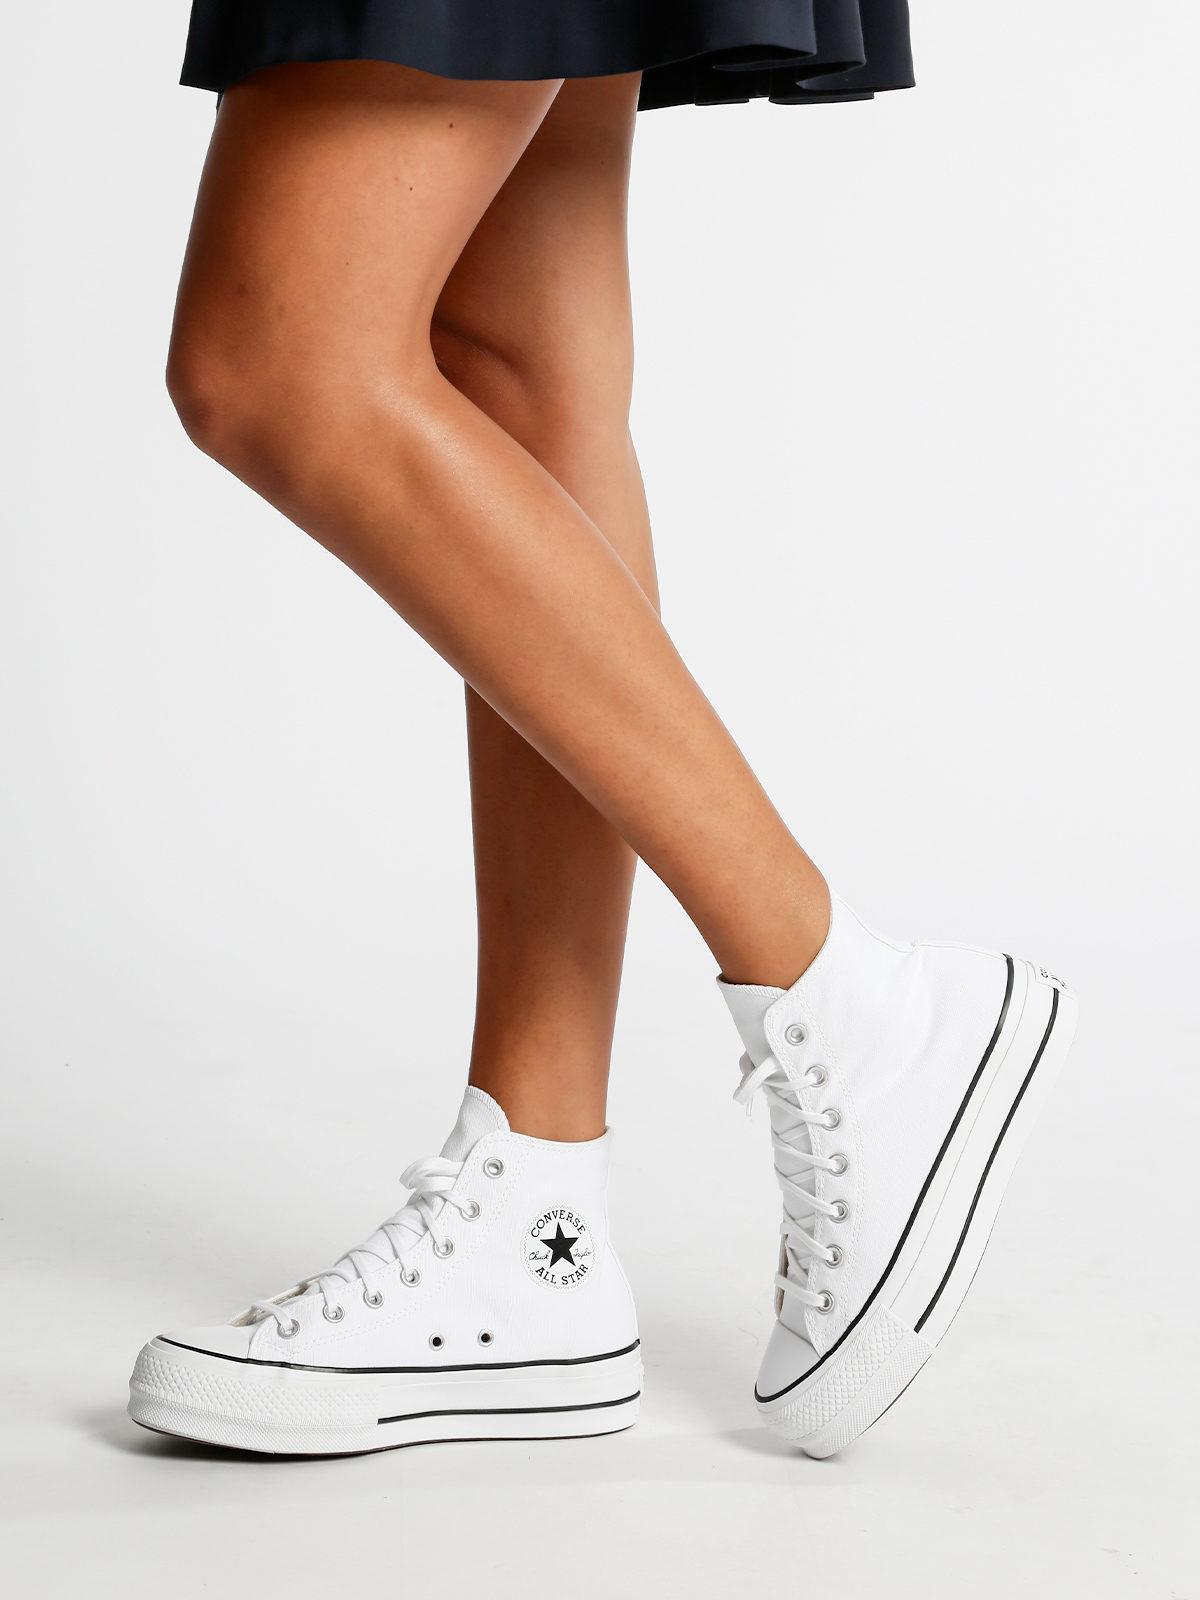 Converse CHUCK TAYLOR ALL STAR LIFT - Sneakers alte con platform ...